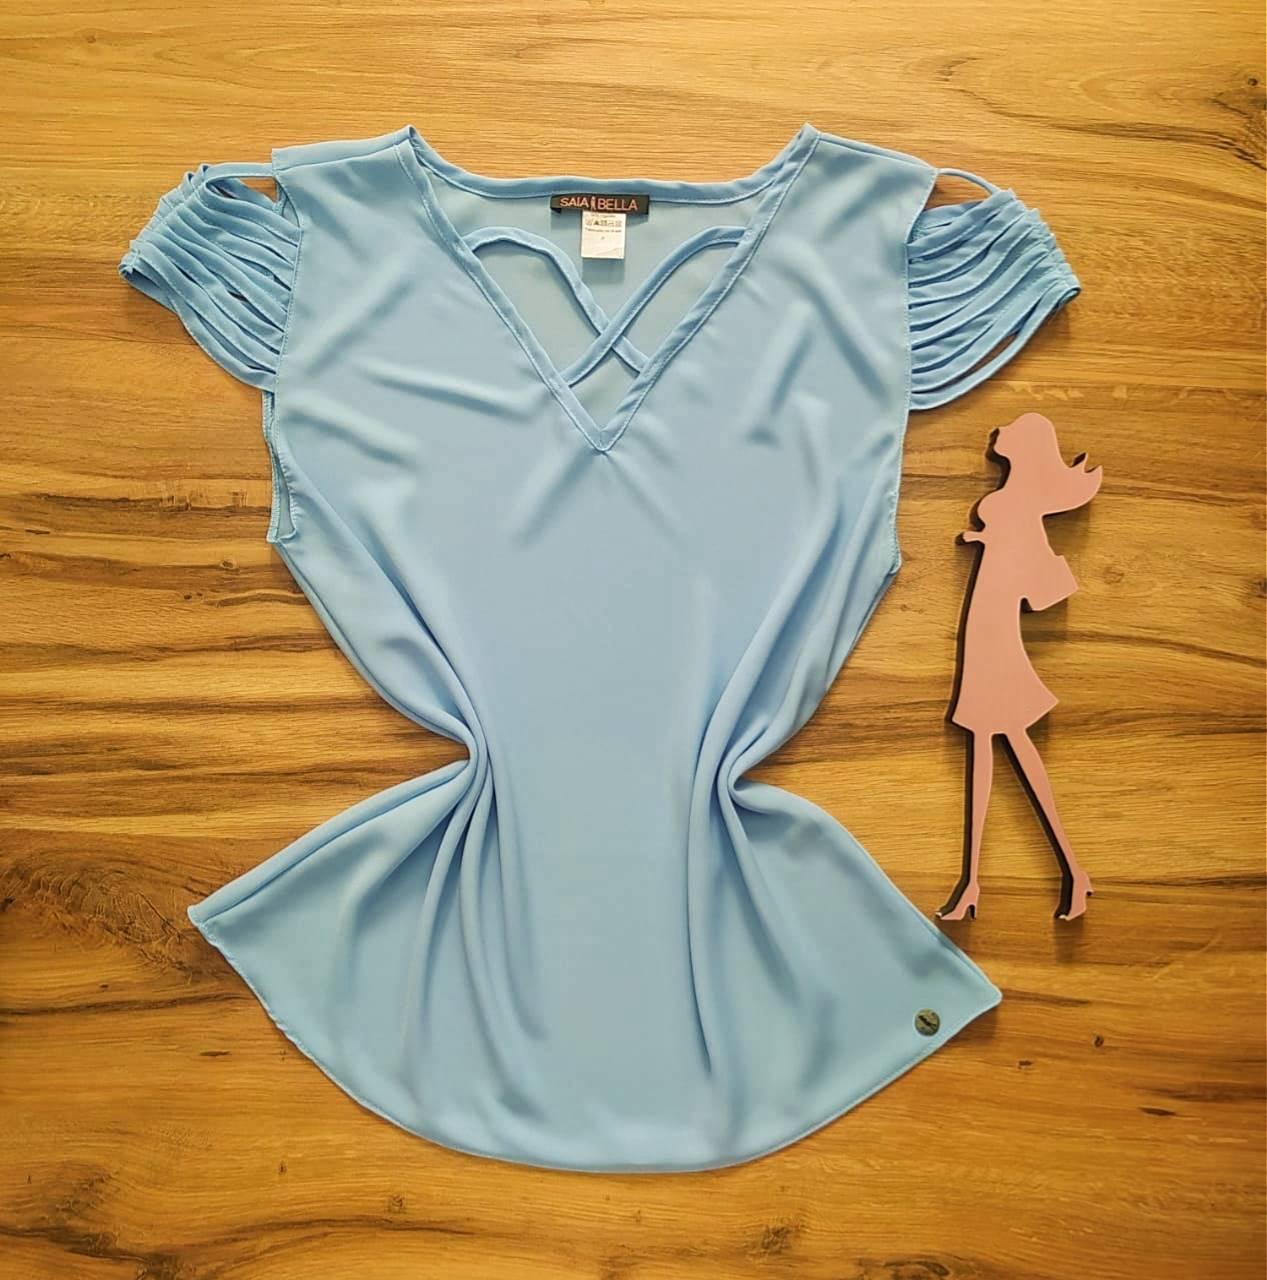 Blusa Sheila Saia Bella - SB8018804. azul bebê